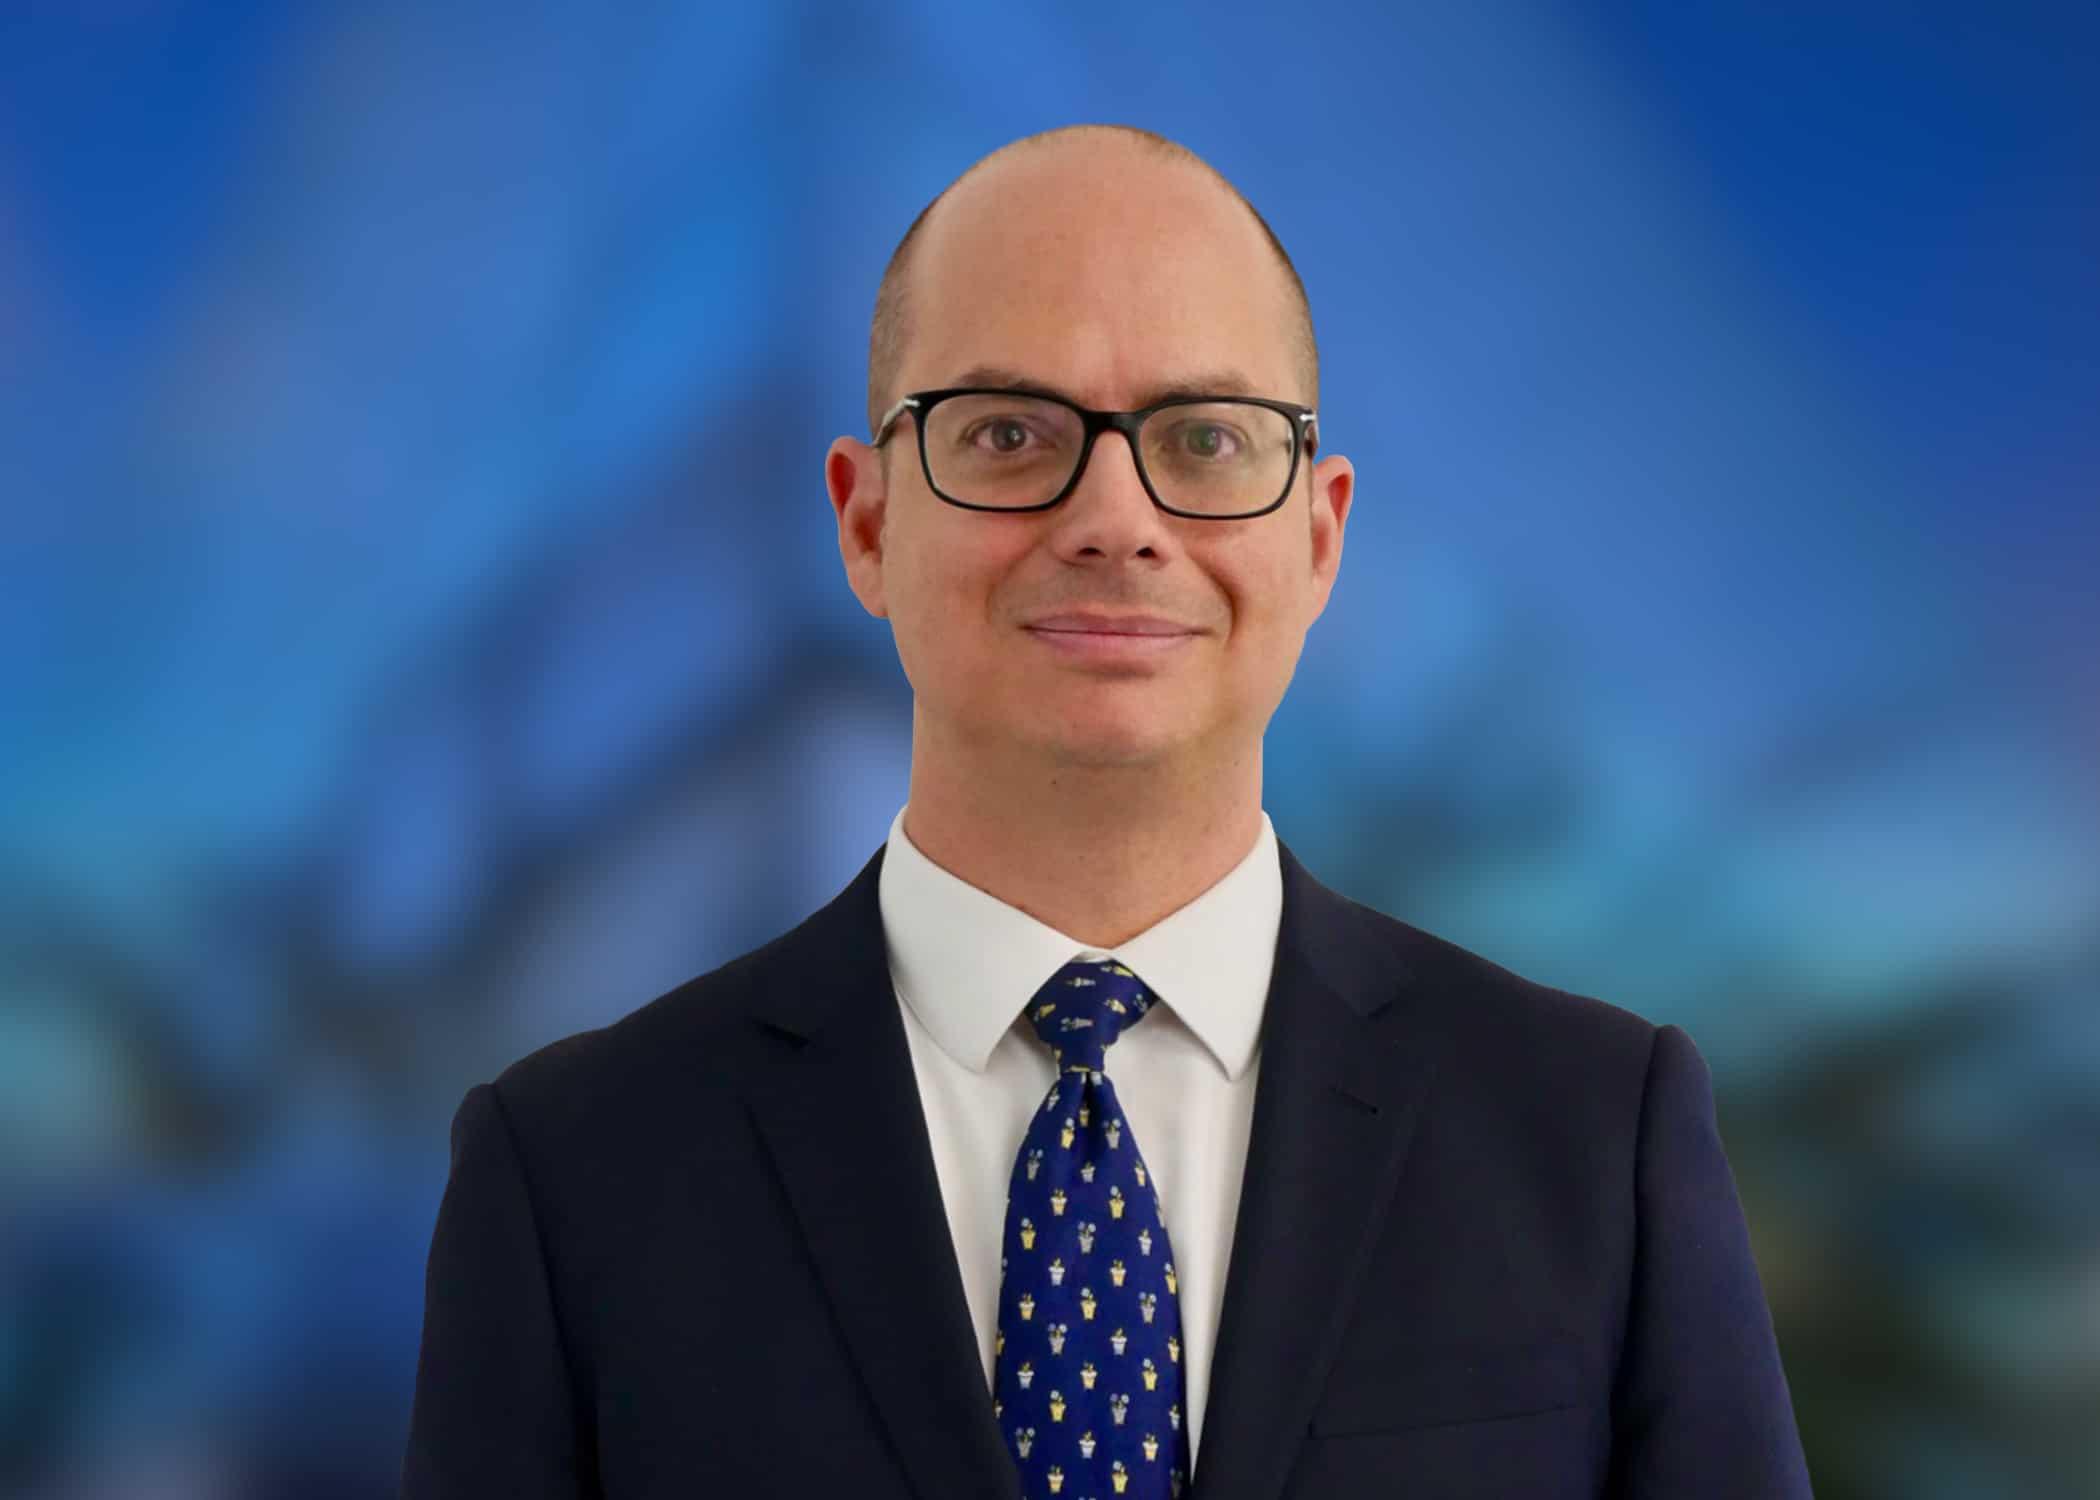 Kent MillwardCarlos Noel | Arizona Divorce Attorney